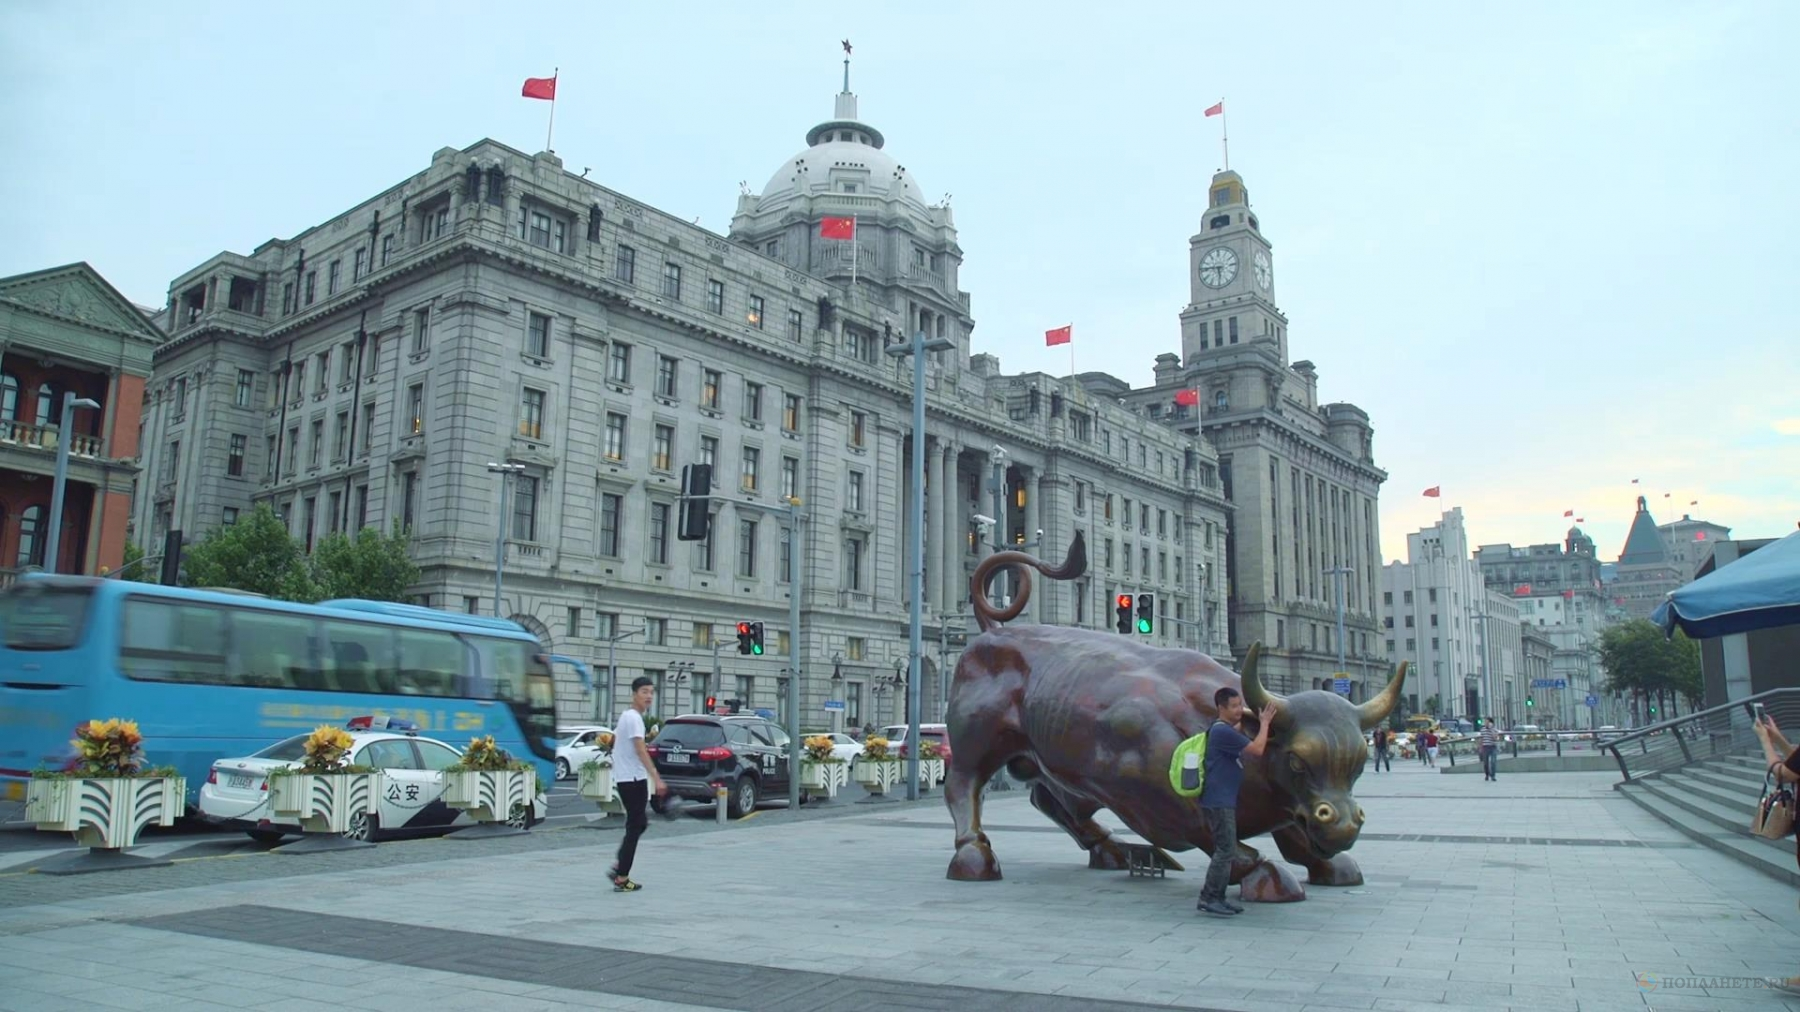 Прогулки по Шанхаю. Набережная Вайтань